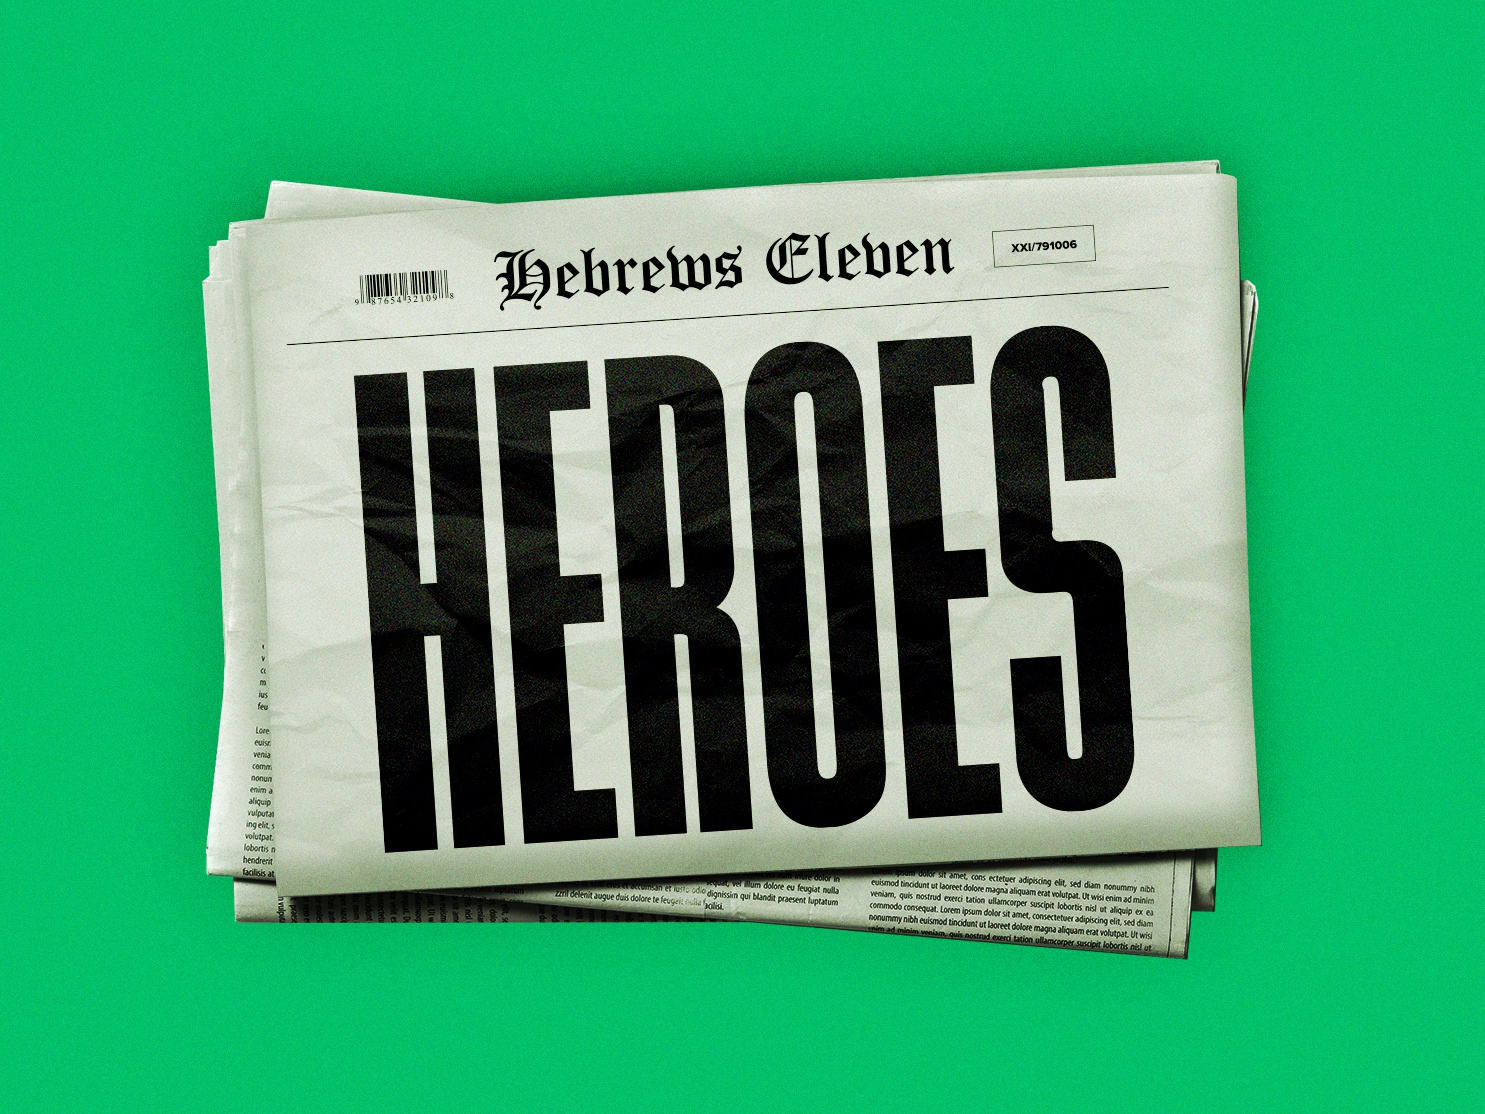 Heroes sermon title sermon art newspaper news art sermon series logo typography letter illustration church